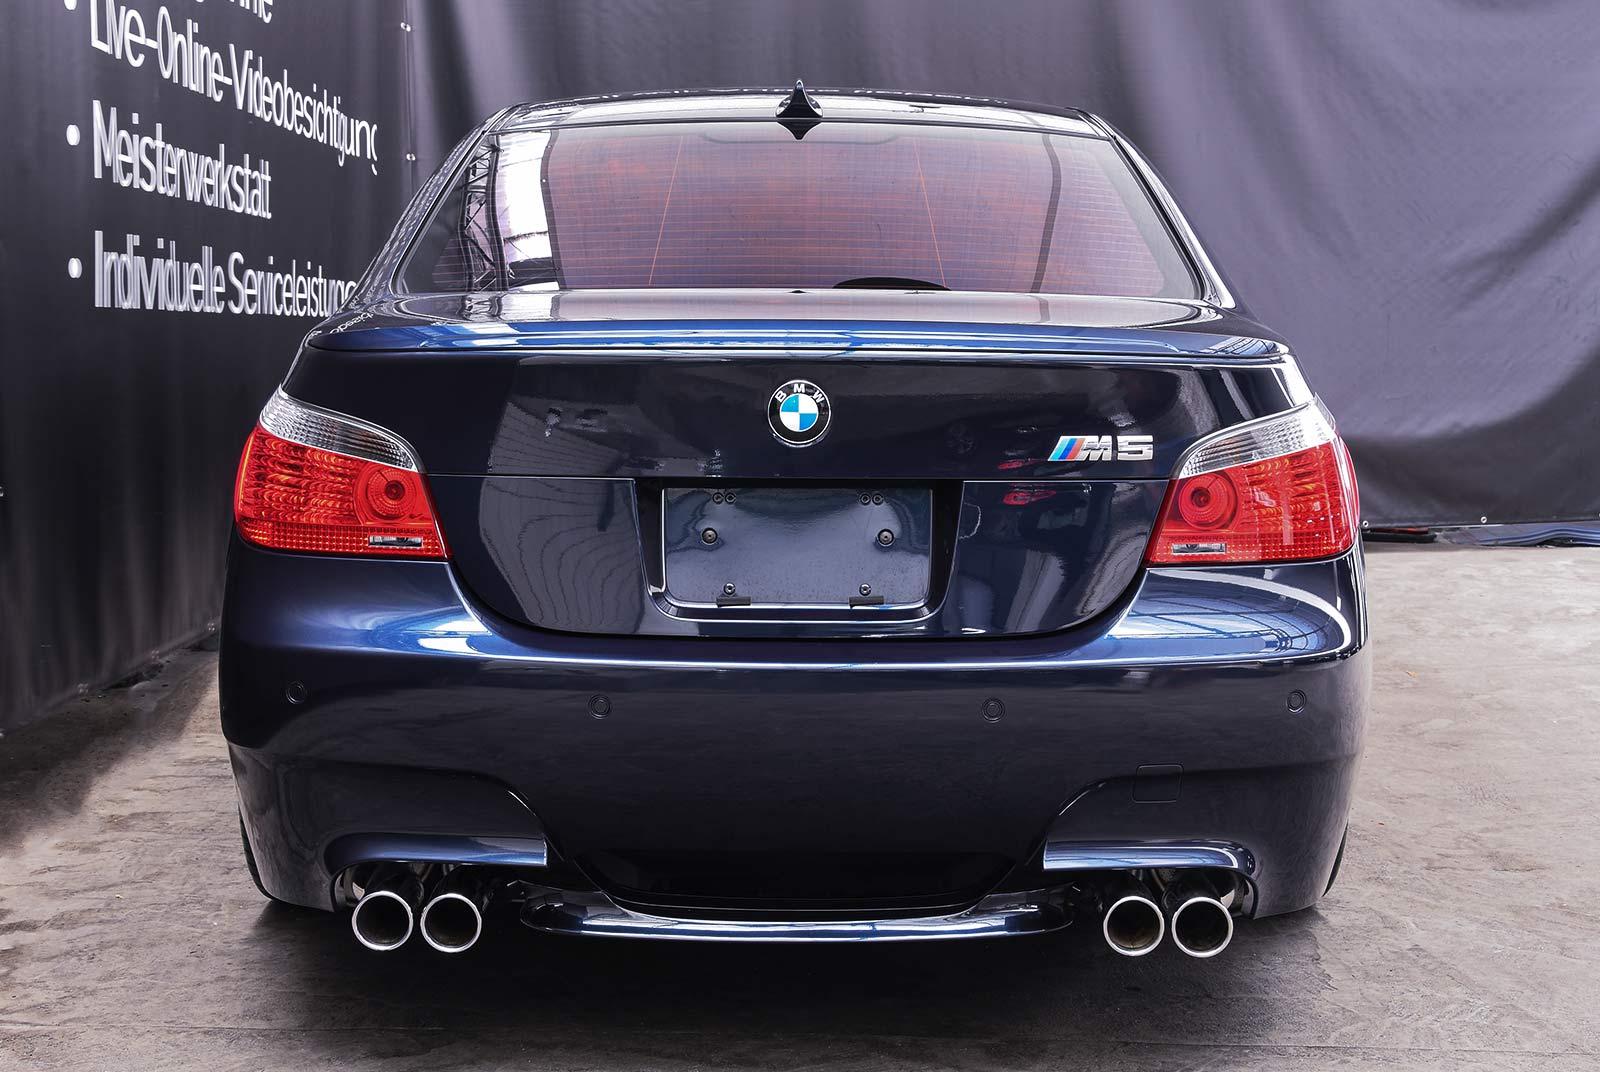 11bmw_m_5_blaulila_creme_BMW-2353_04